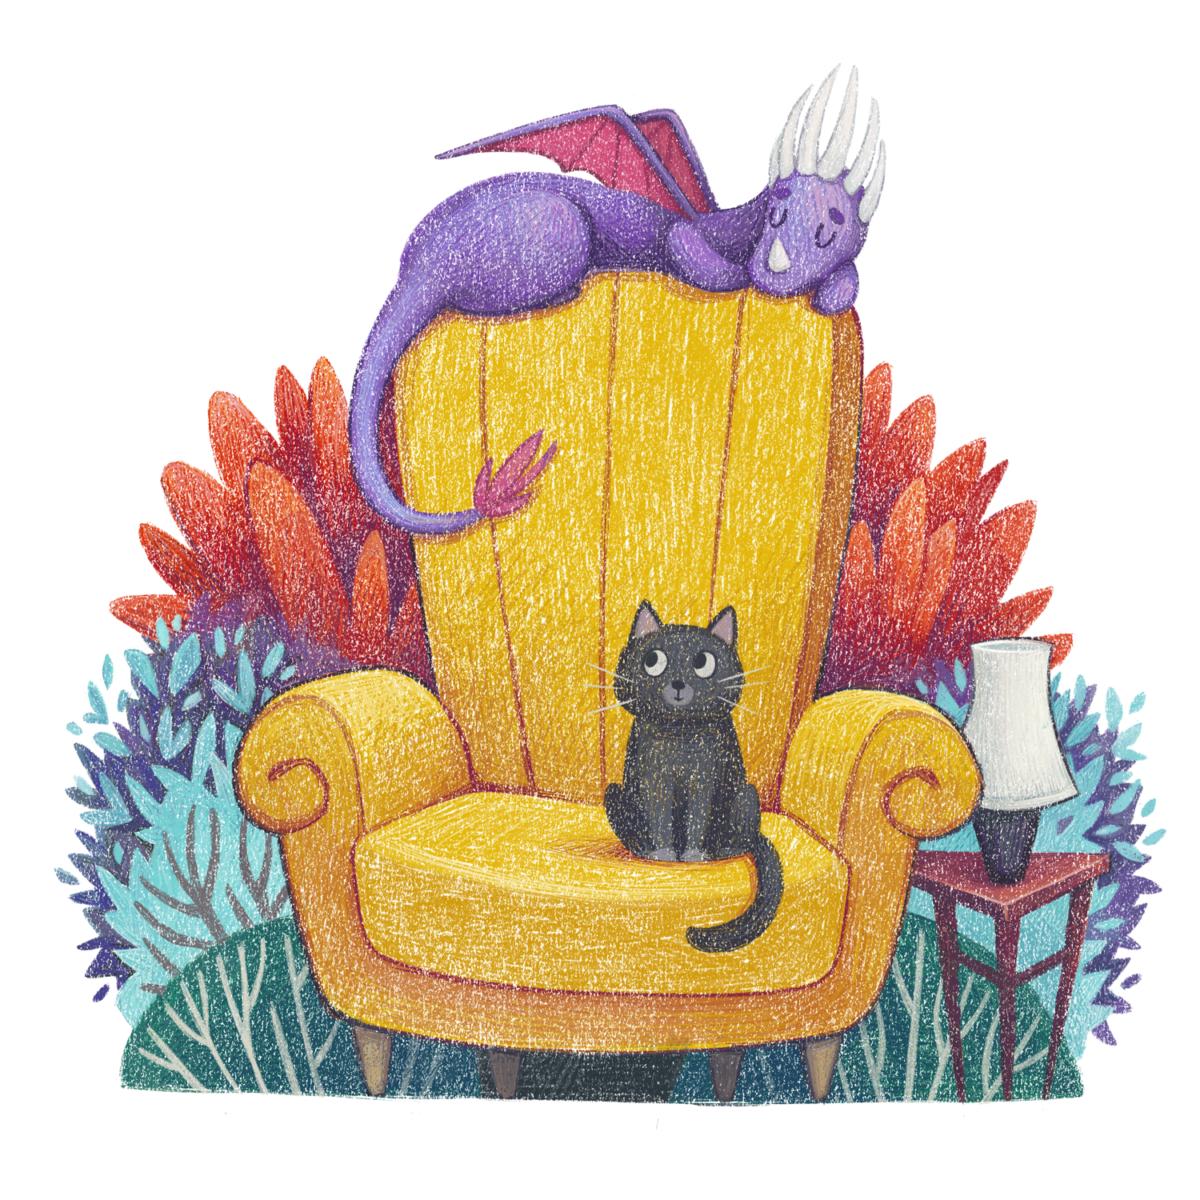 Armchair Dragon - children's book illustration by Margarita Levina